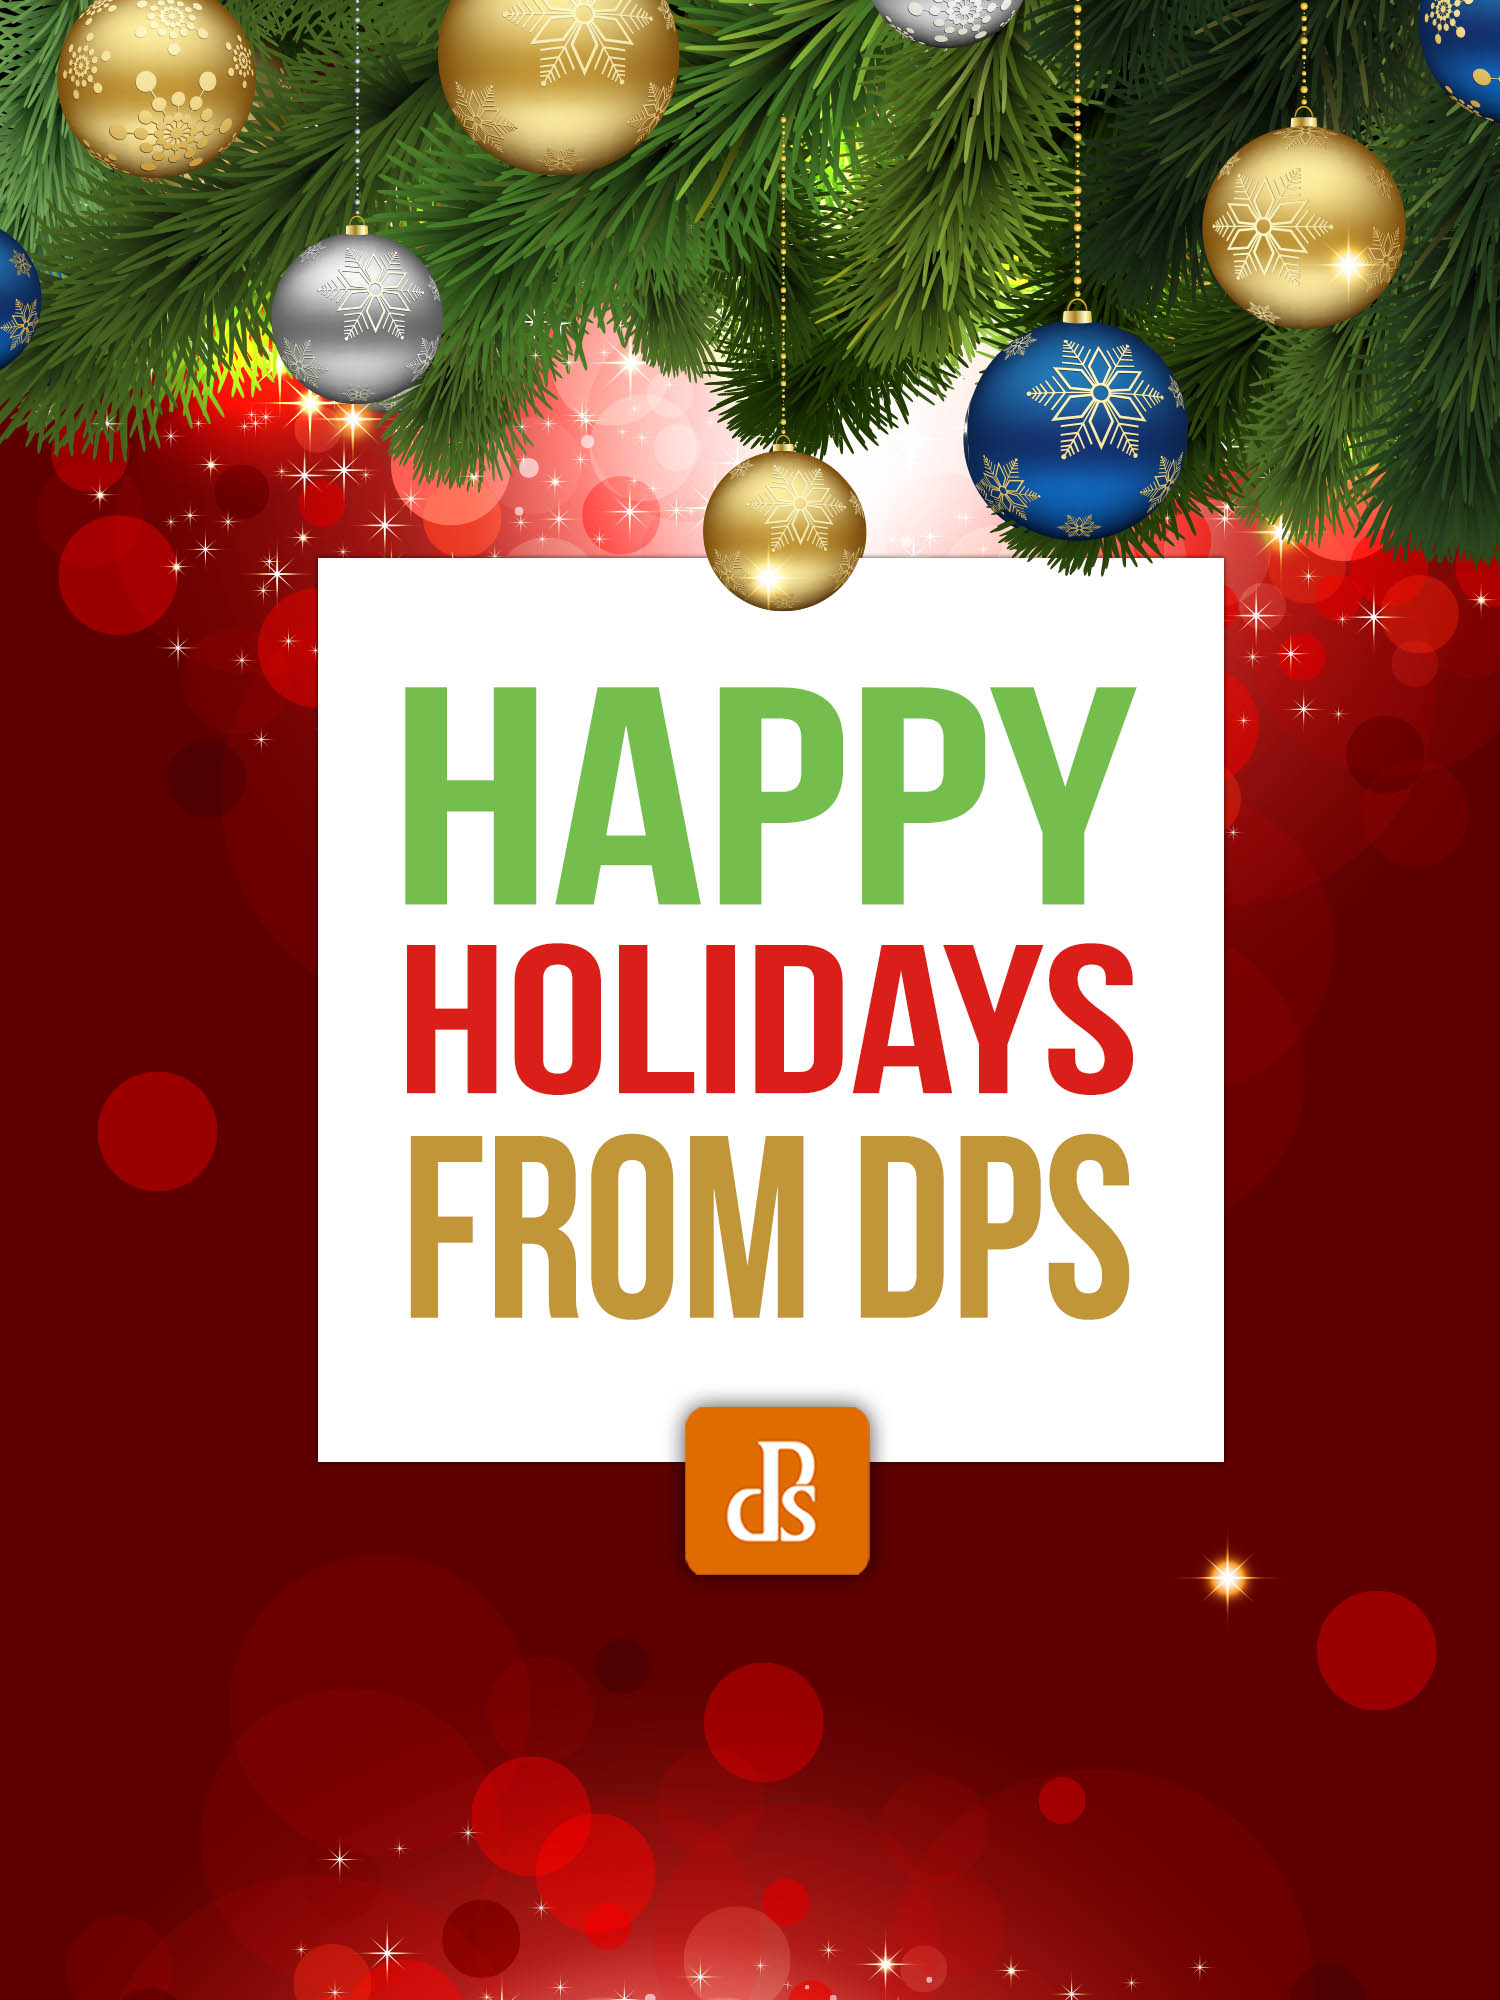 Happy Holidays from dPS